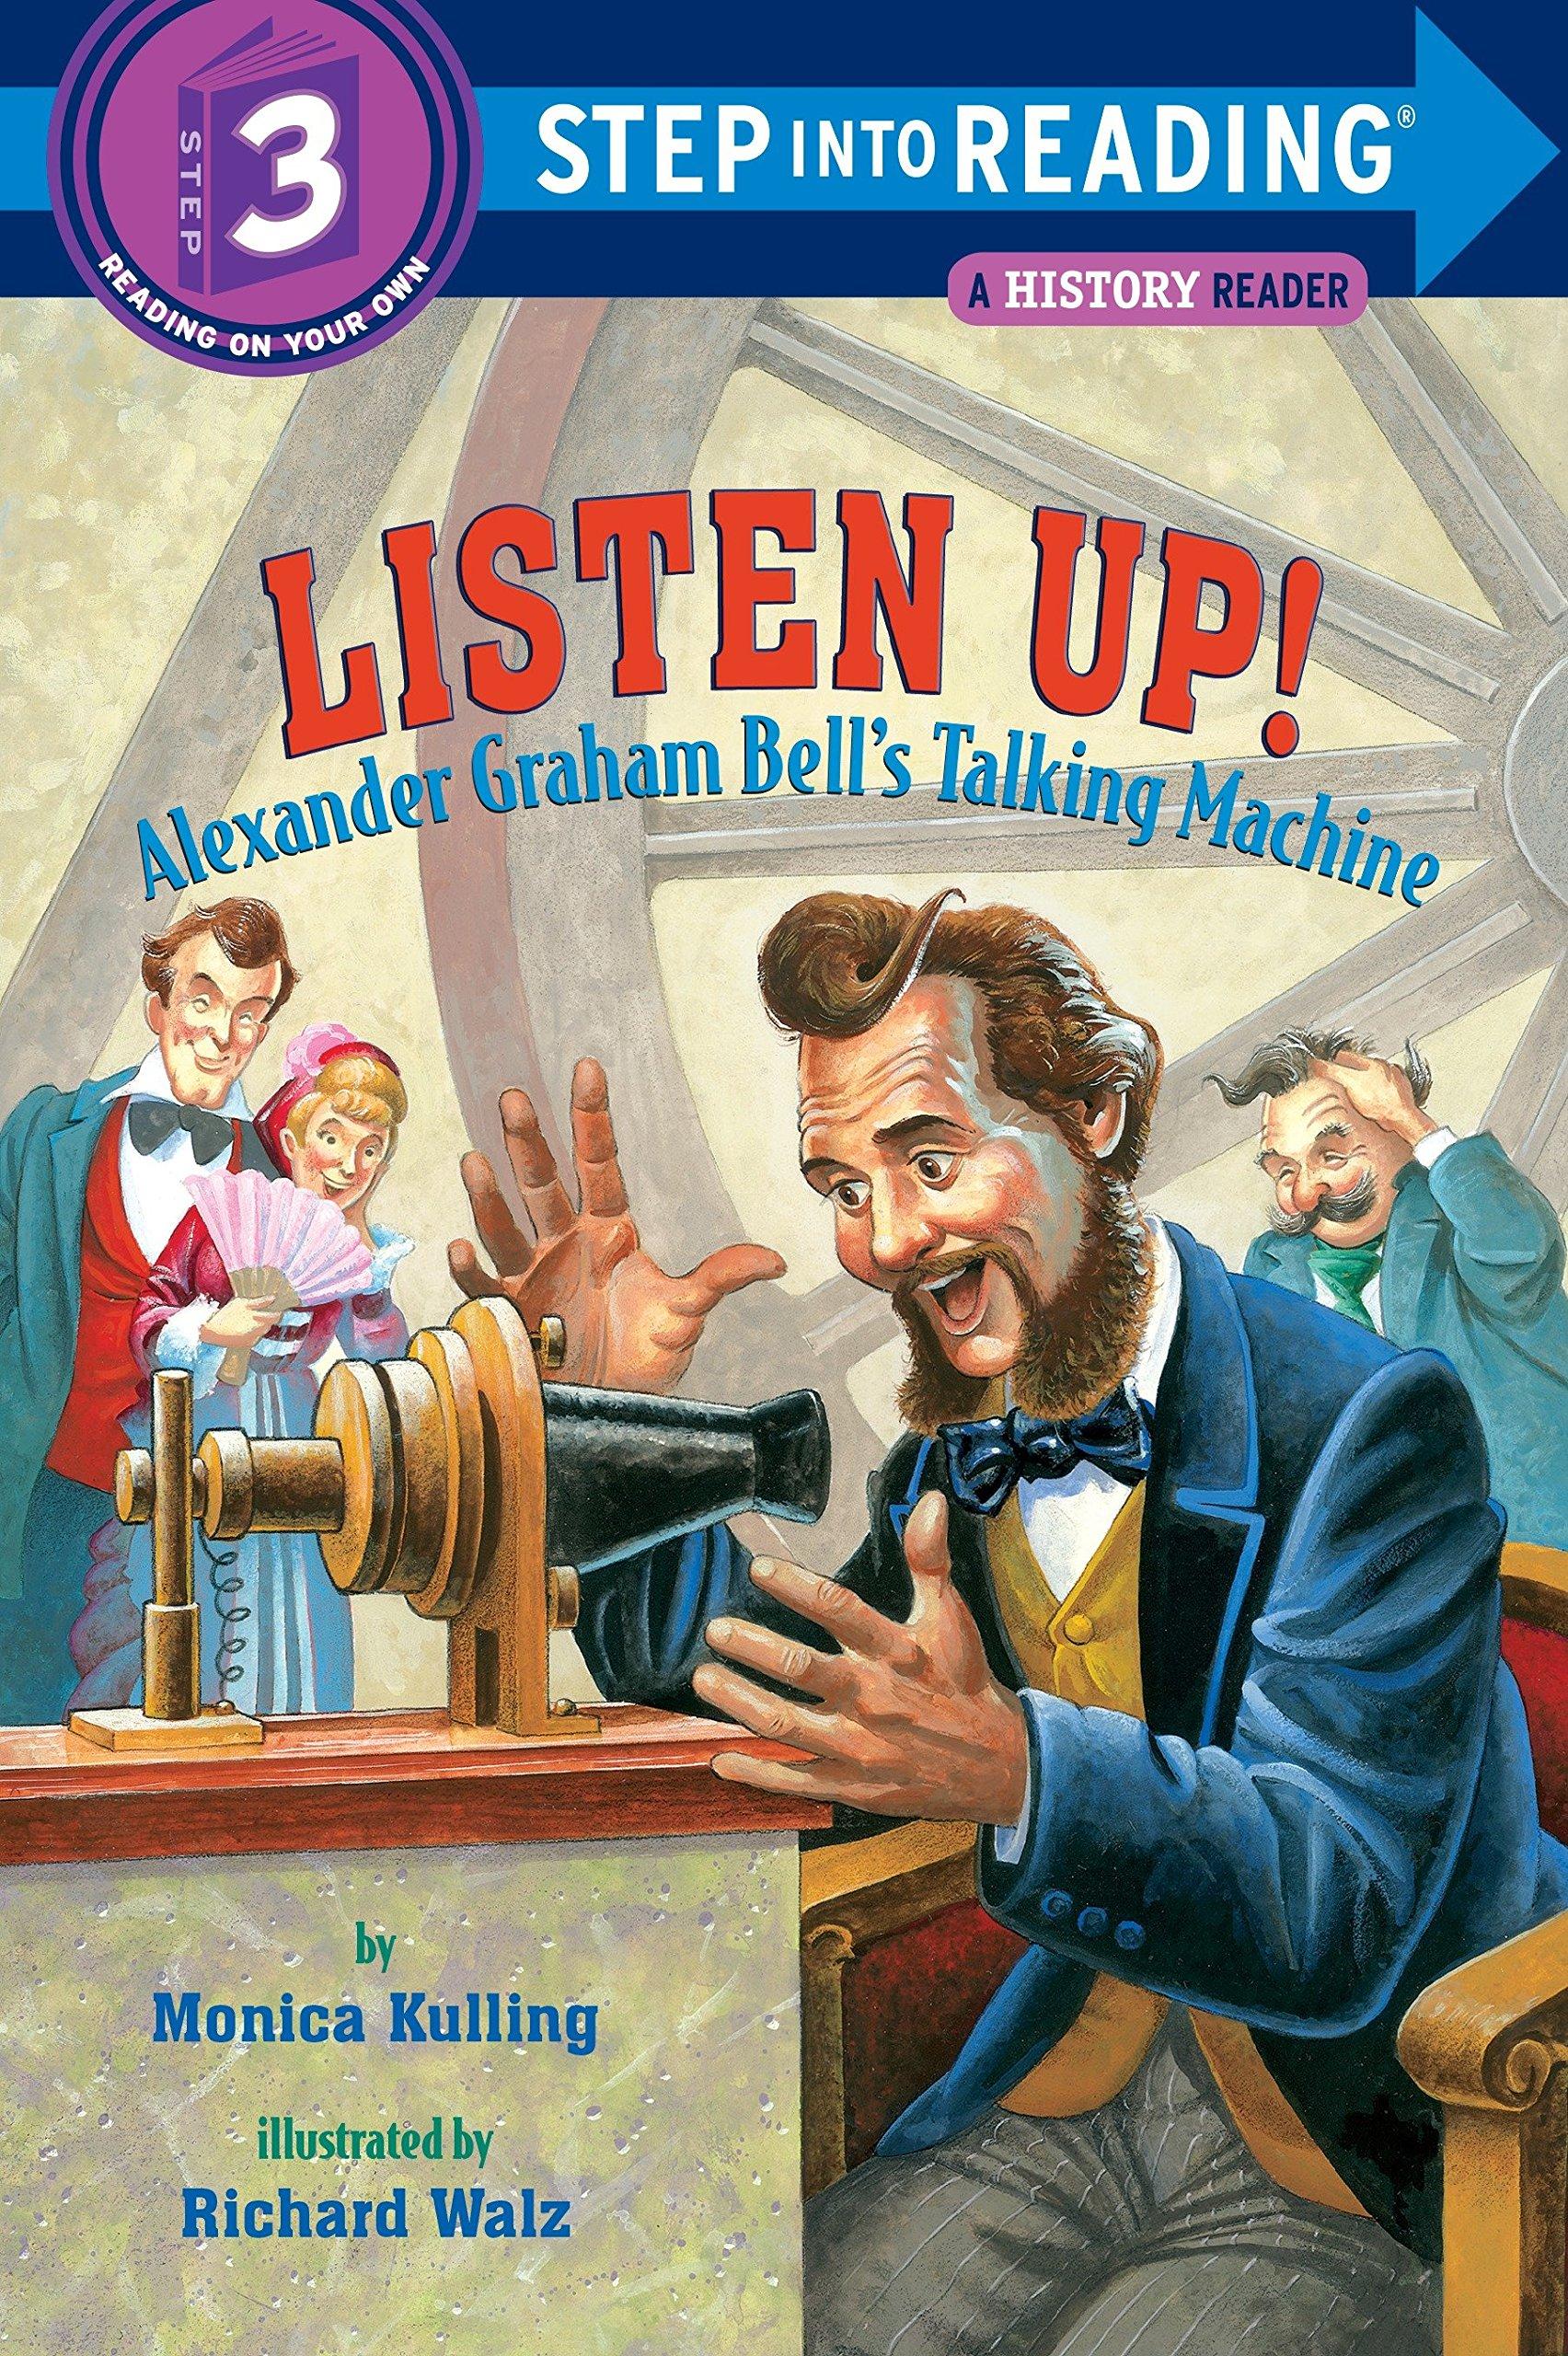 Listen Up!: Alexander Graham Bell's Talking Machine (Step into Reading) Paperback – August 28, 2007 Monica Kulling Richard Walz 0375831150 Biographical - United States